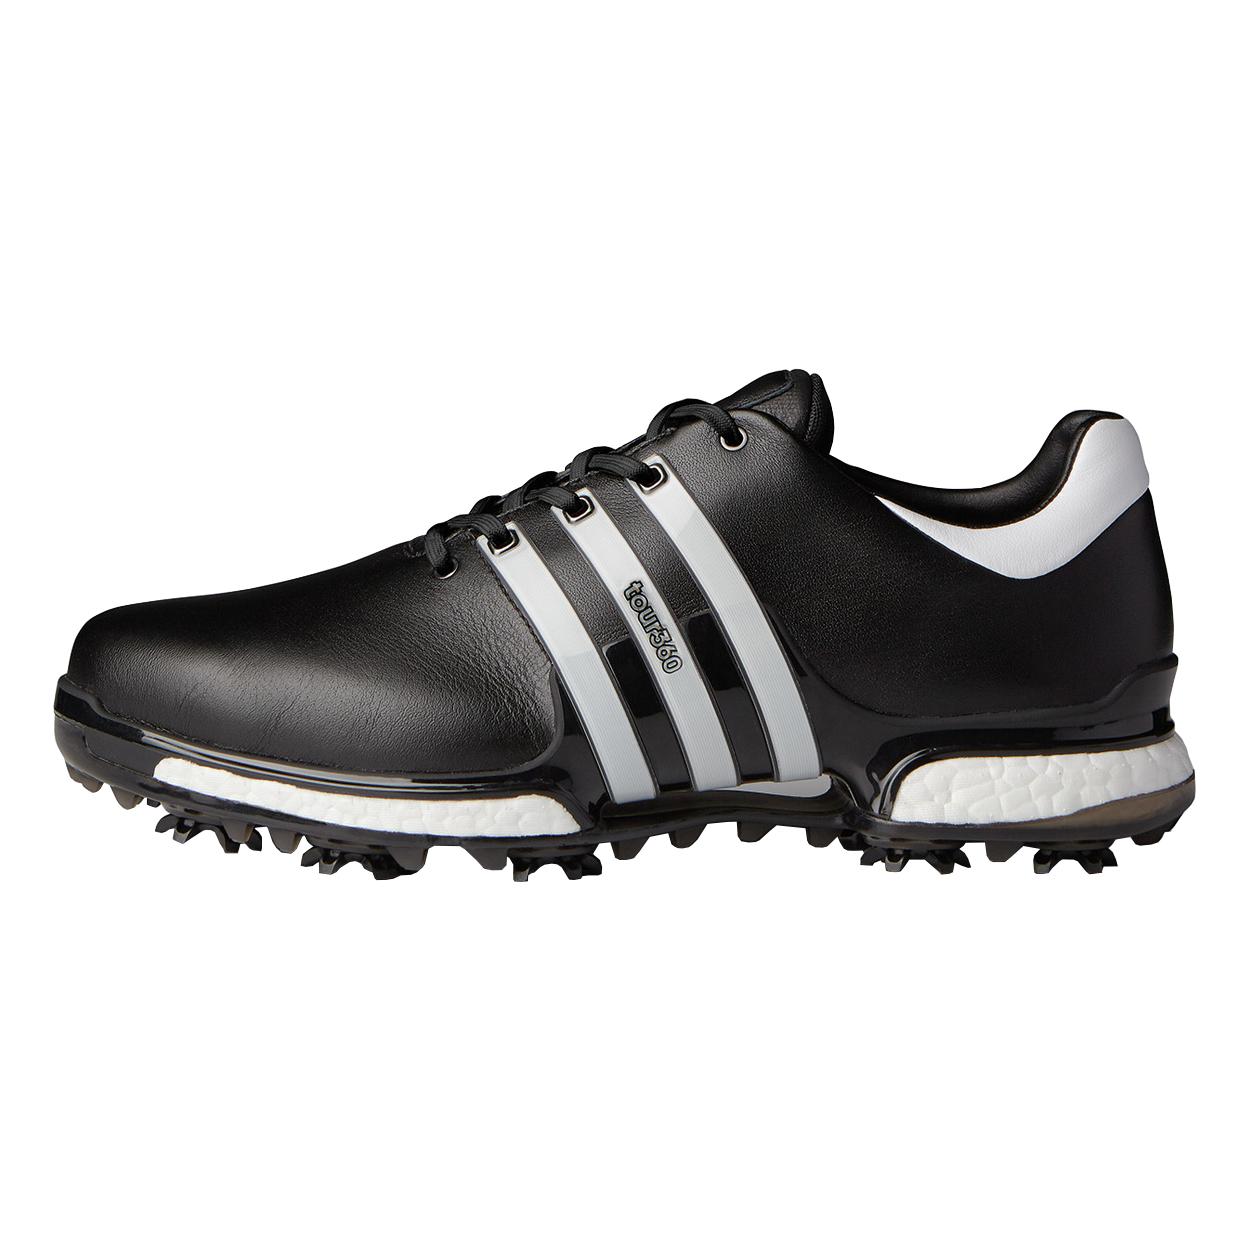 Adidas-Tour-360-2-0-Zapatos-De-Golf-De-Cuero-A-ESTRENAR miniatura 8